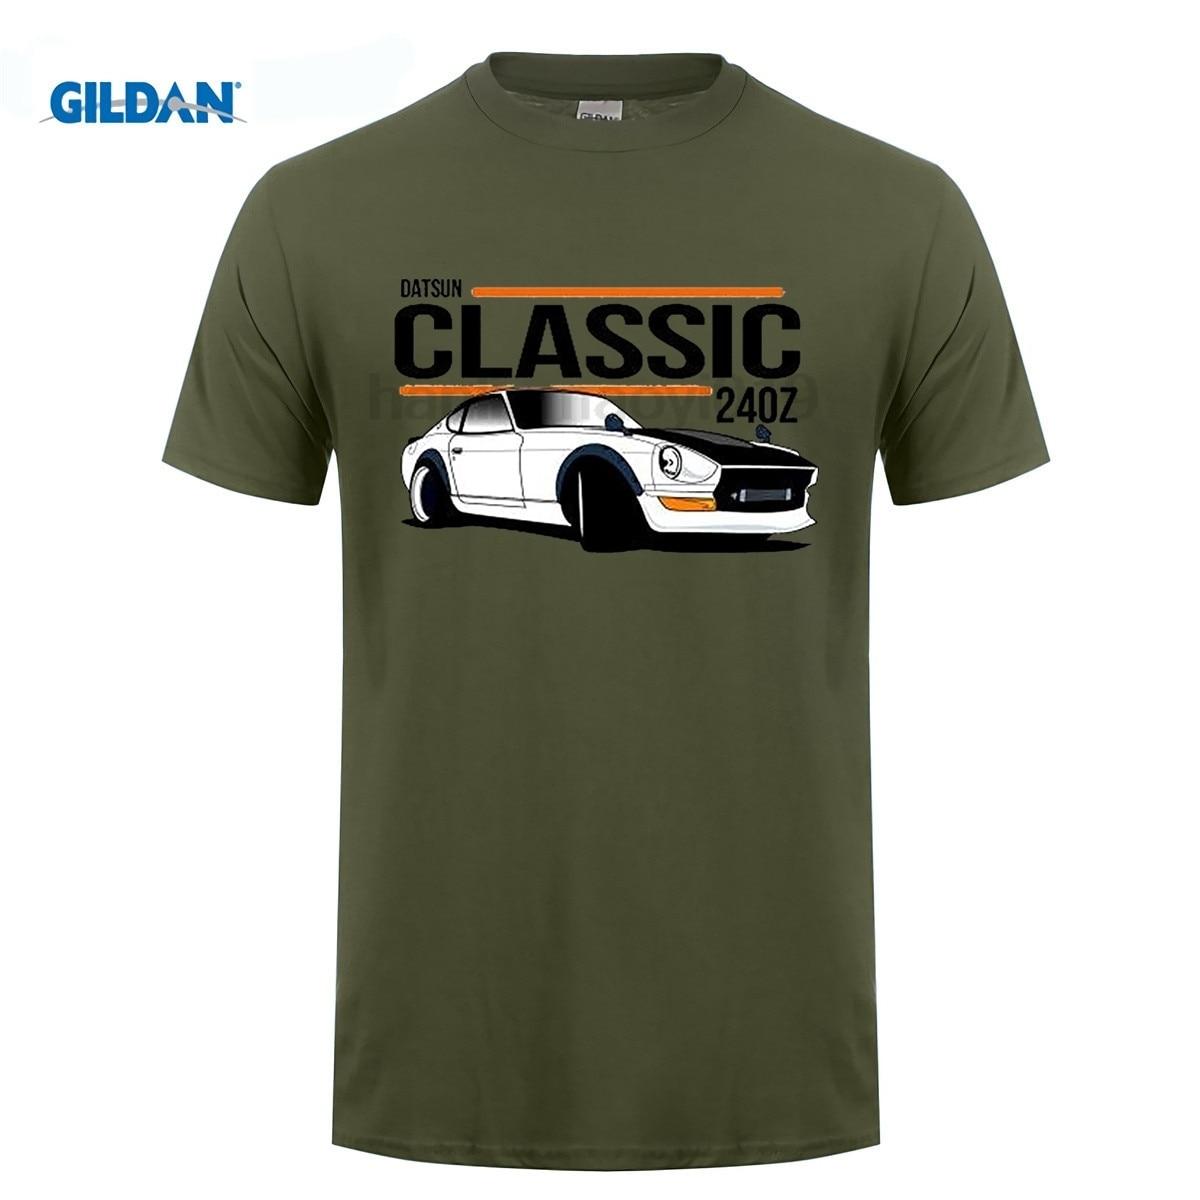 GILDAN 2017 Hot Sell Men 39 S High Quality Custom Printed Tops Hipster Tees Men 39 s DATSUN 240Z Design Cotton Tee Shirt in T Shirts from Men 39 s Clothing